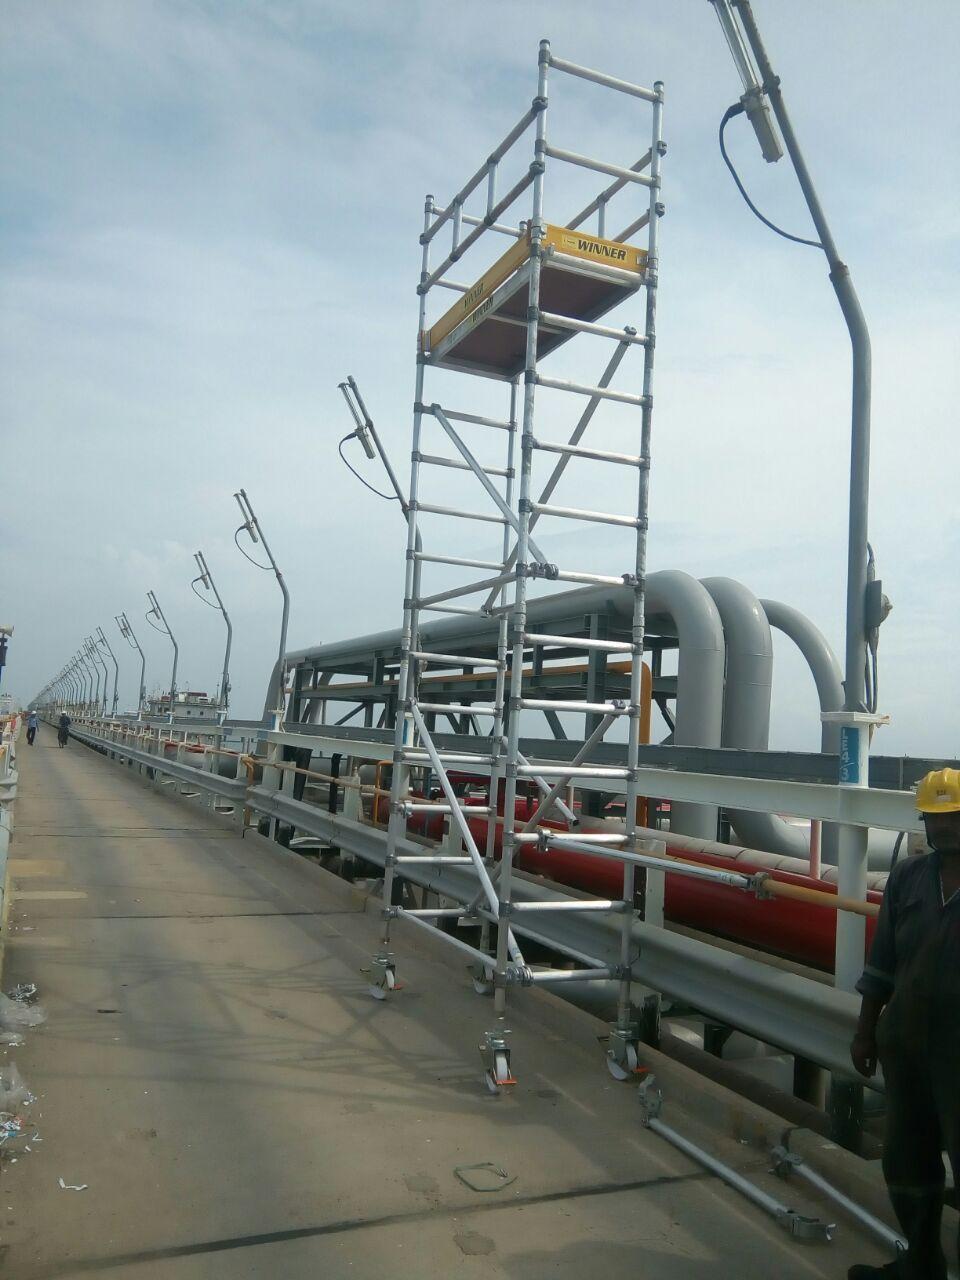 Nerro version scaffolding